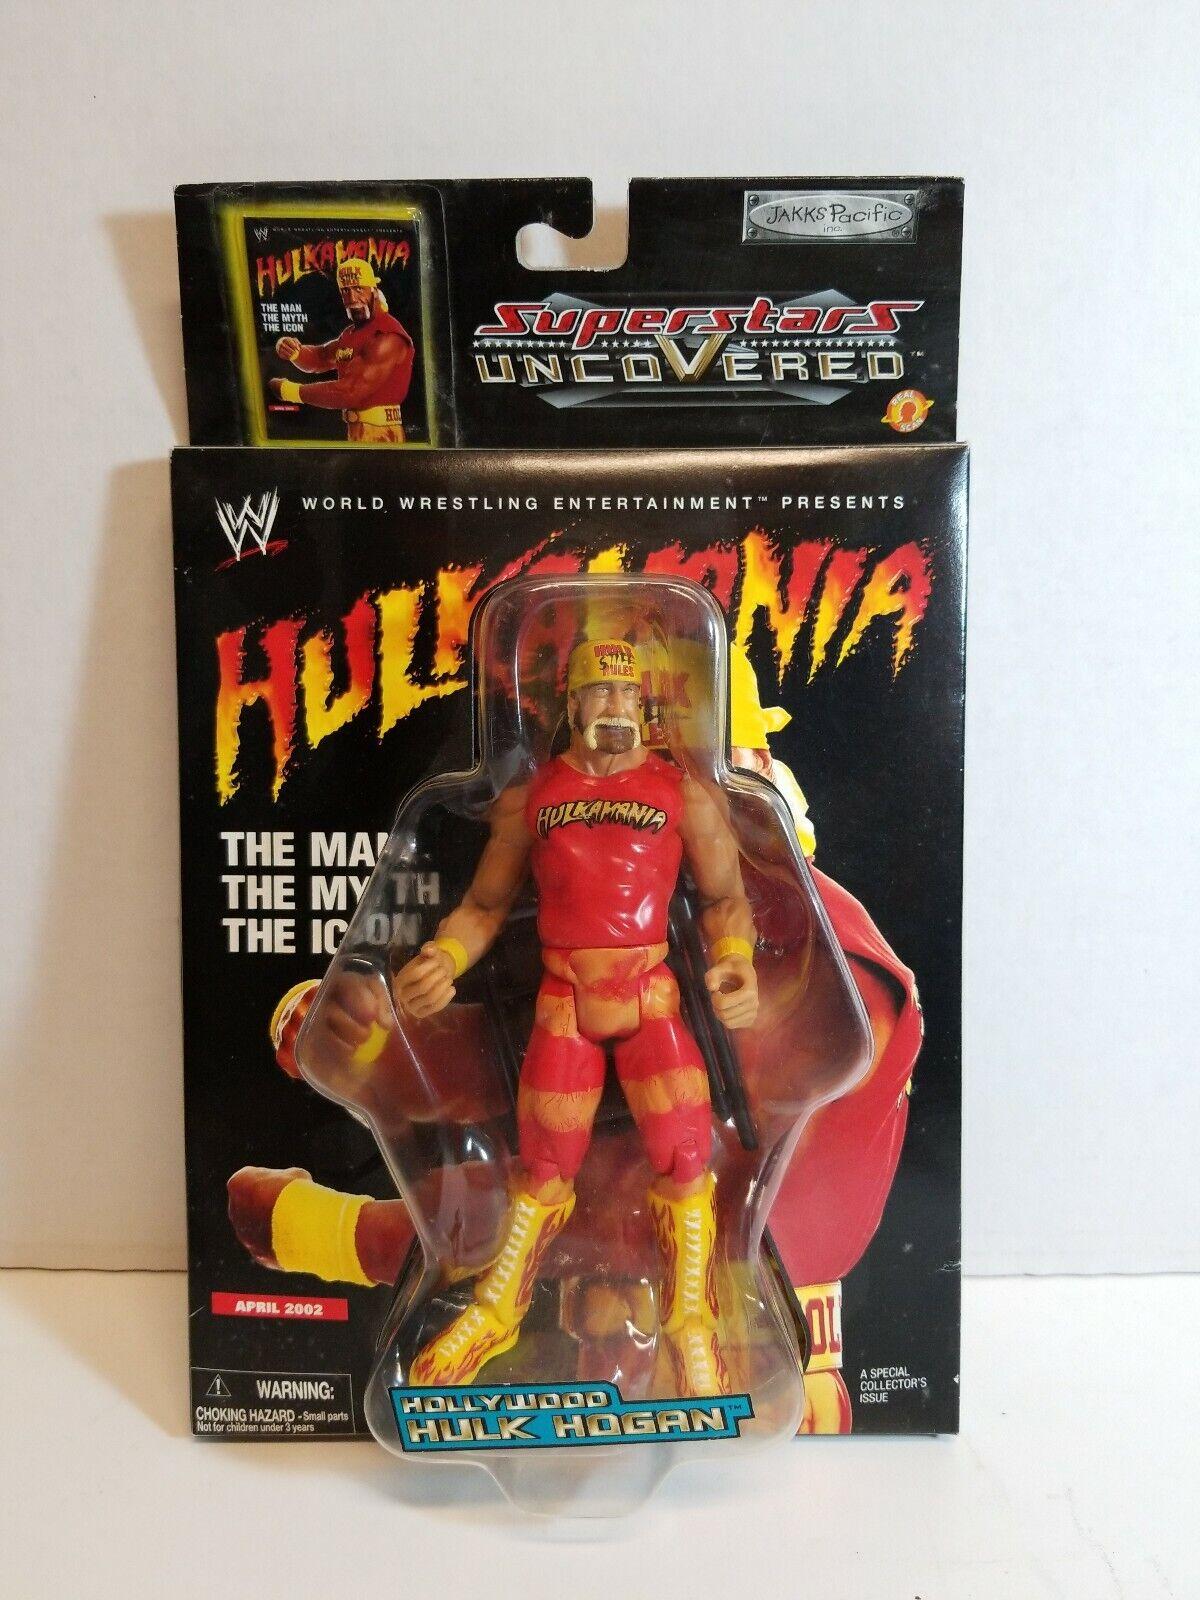 2002 Wrestling WWE Superstar Uncoverosso MOC 7  Hollywood Hulk Hogan Figure Jakks